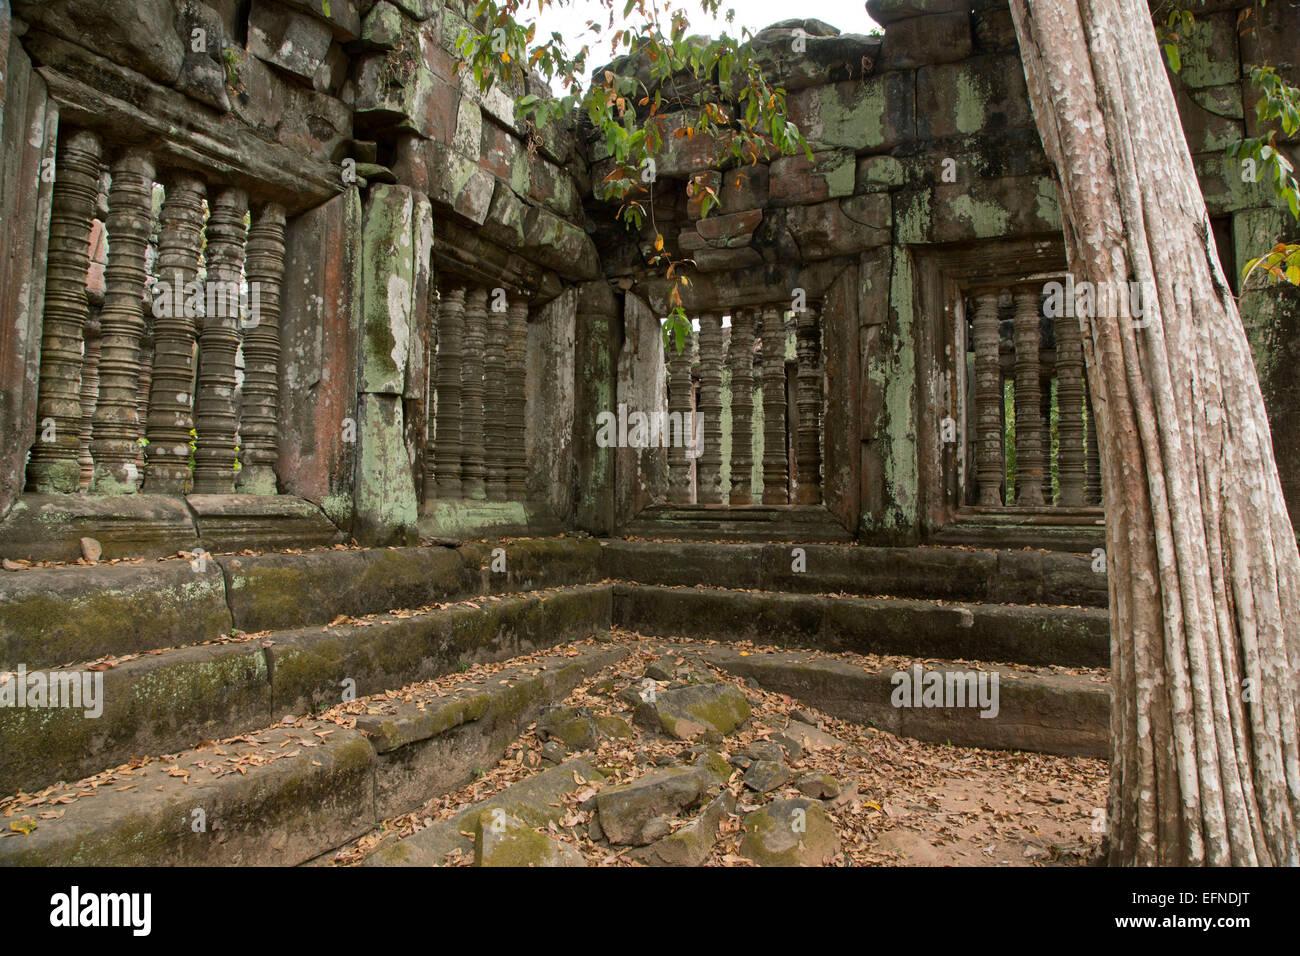 Cambodia, temple of Koh Ker. - Stock Image